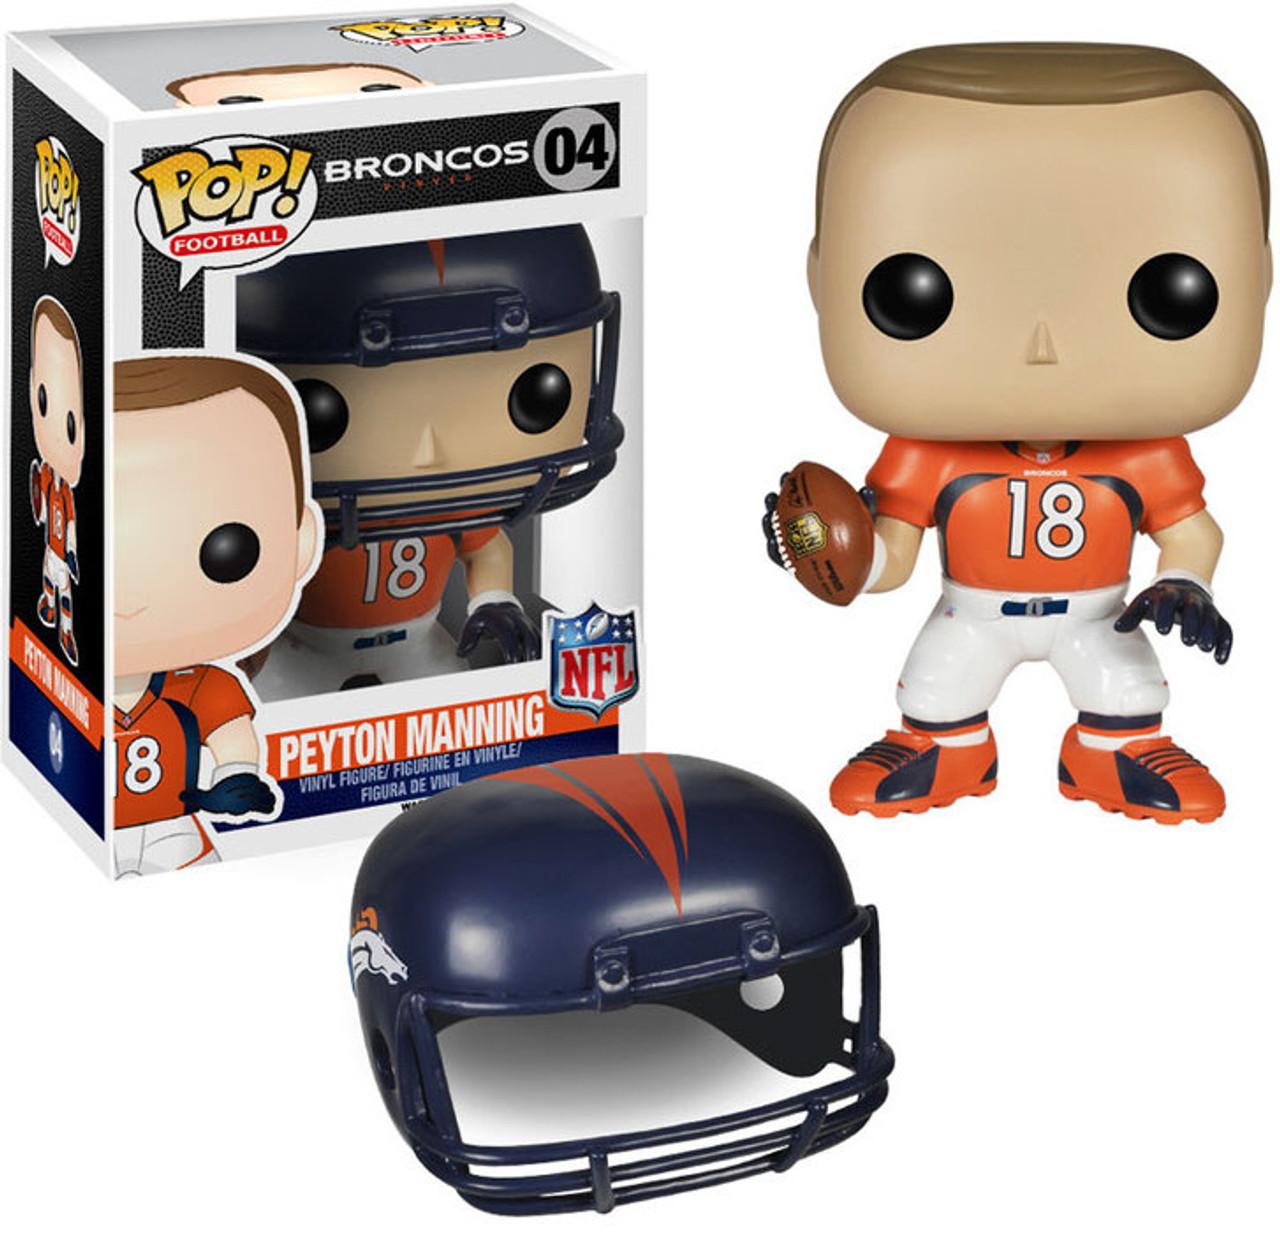 Funko NFL Denver Broncos Funko POP Sports Peyton Manning Vinyl Figure 04 ToyWiz